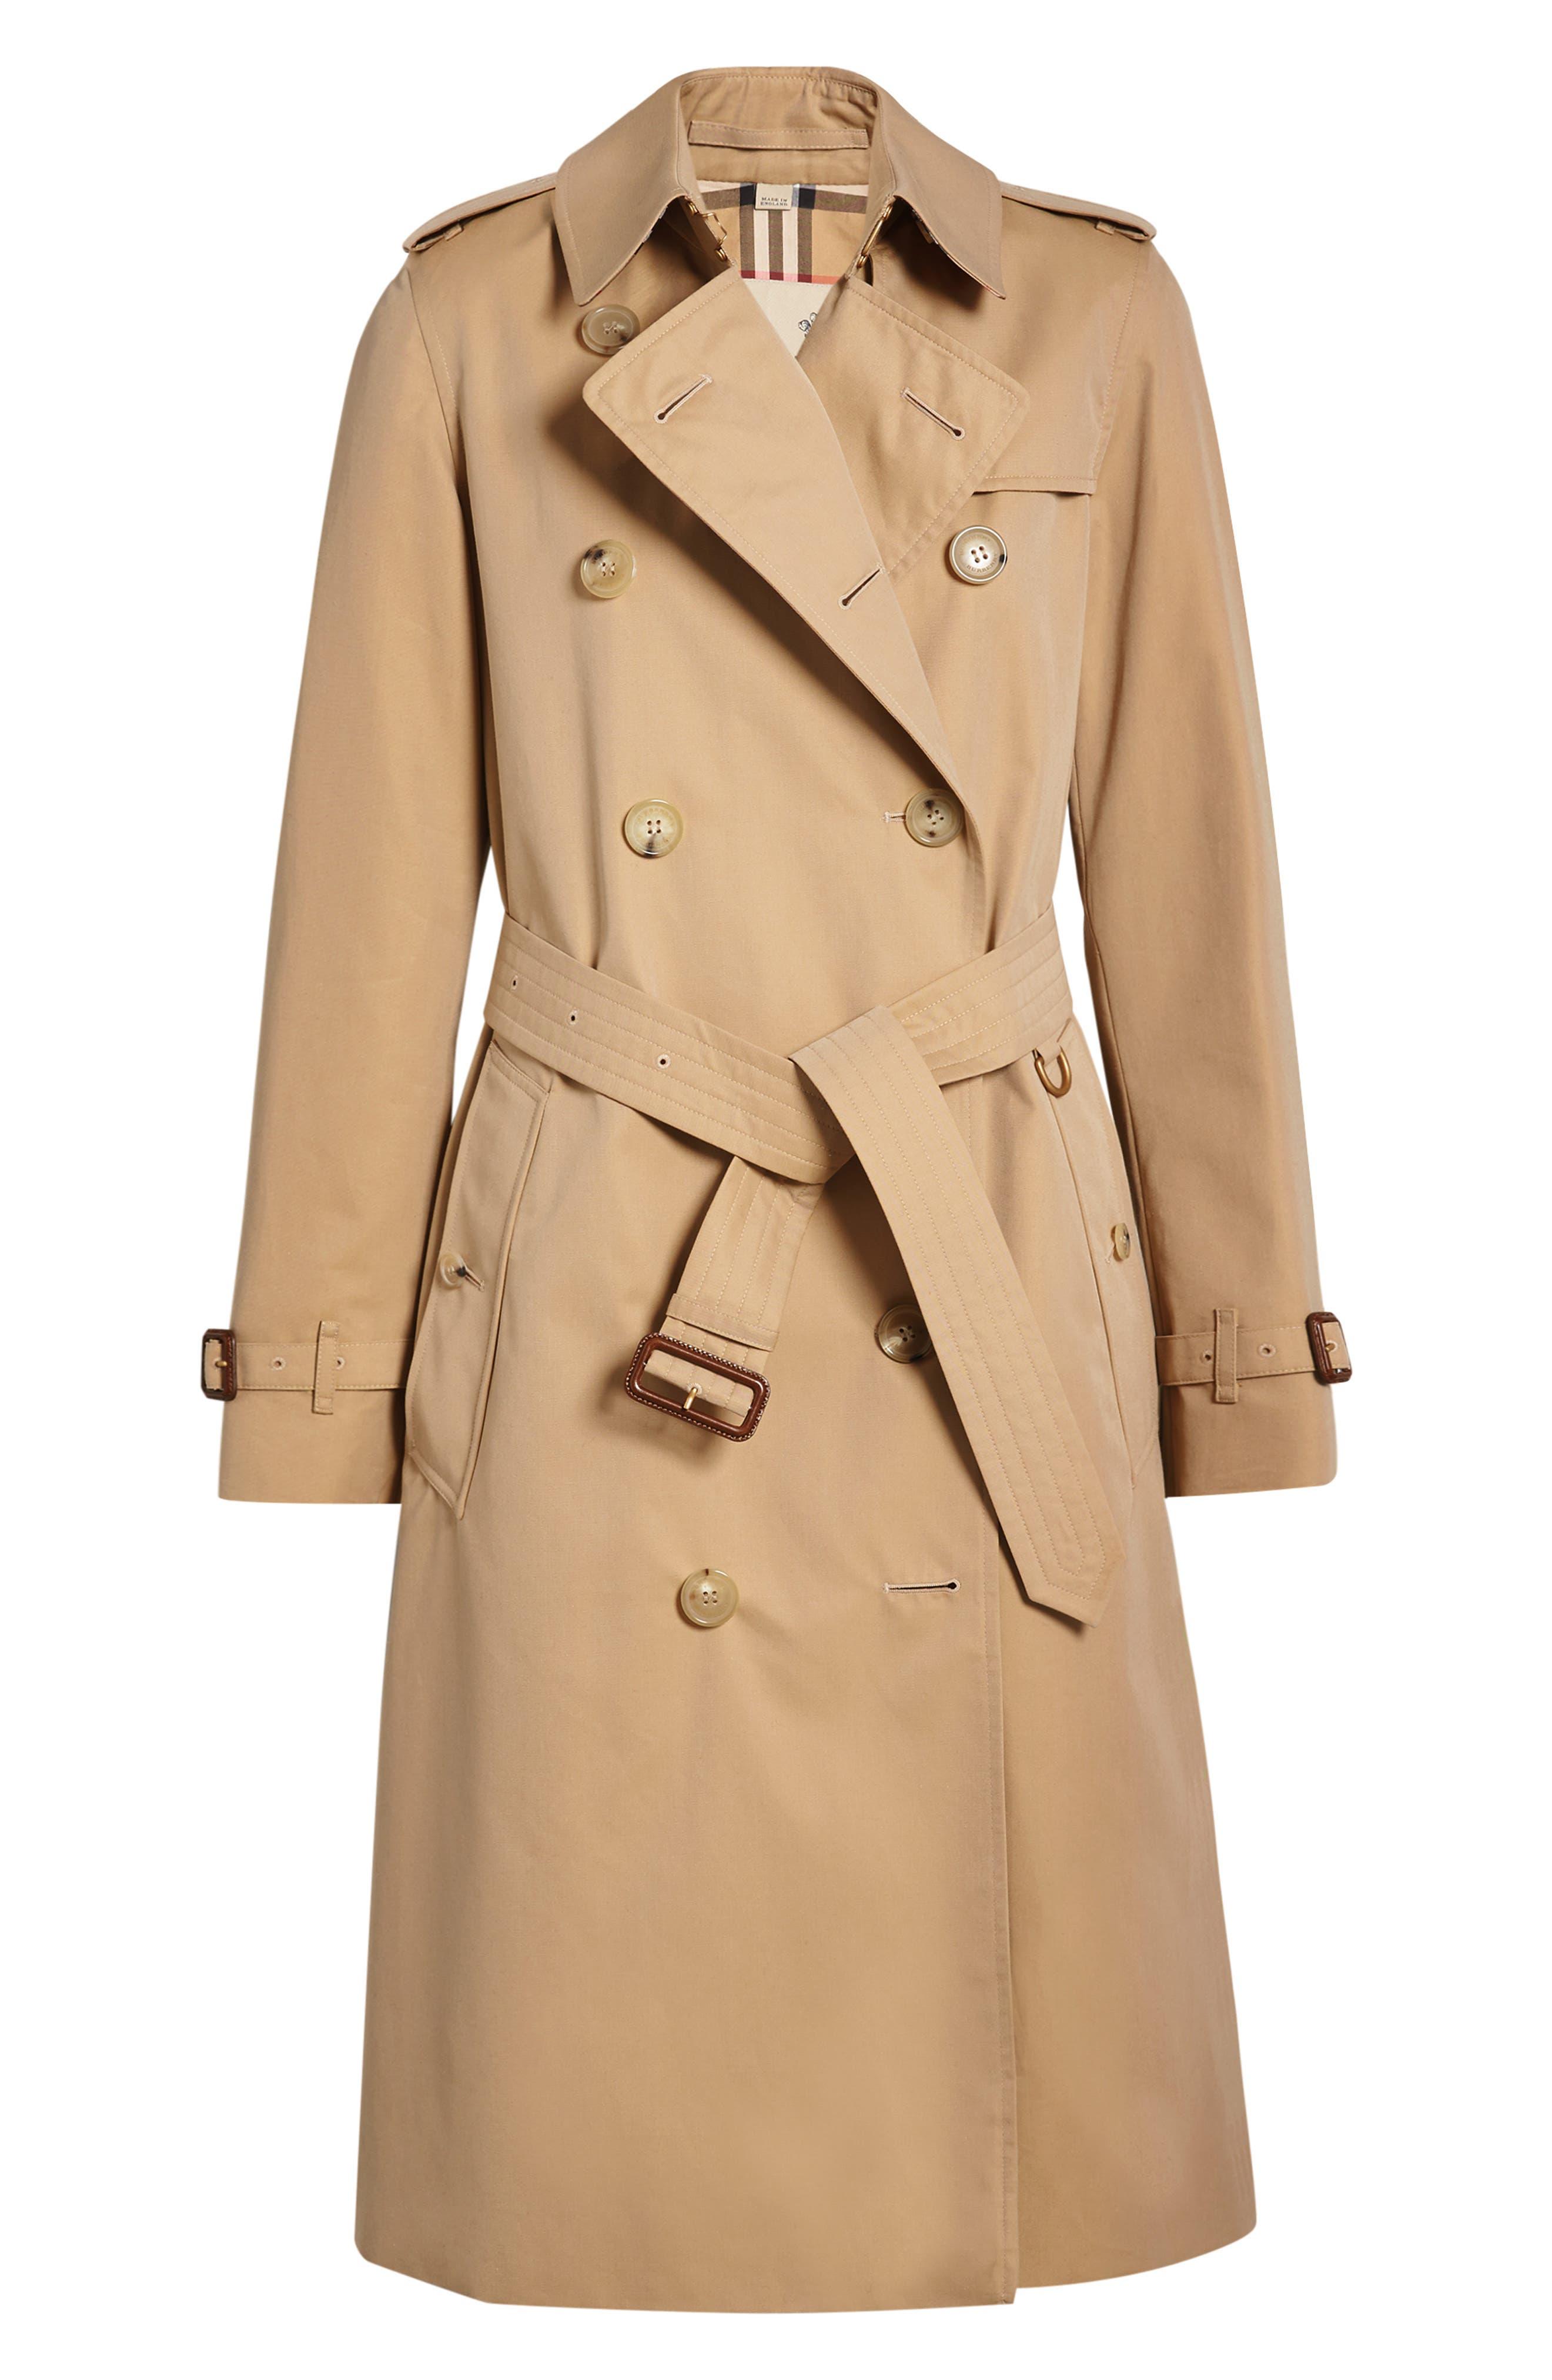 BURBERRY, Kensington Long Trench Coat, Alternate thumbnail 4, color, DARK HONEY